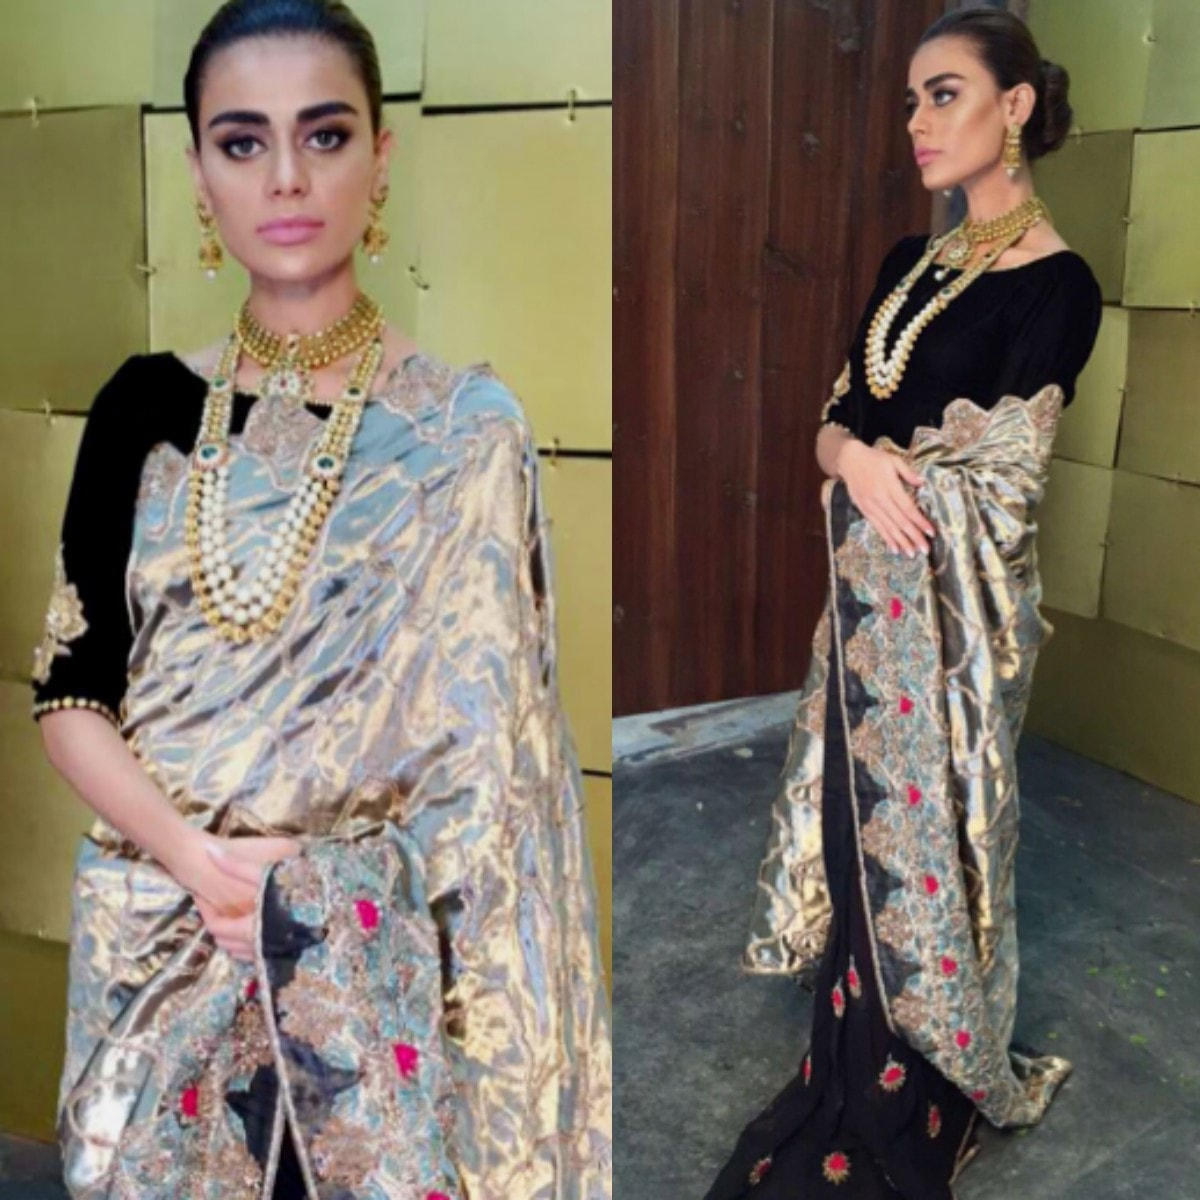 Sadaf Fawad Khan Bridals' William Morris Floral Bouquet sari — Photos from Instagram